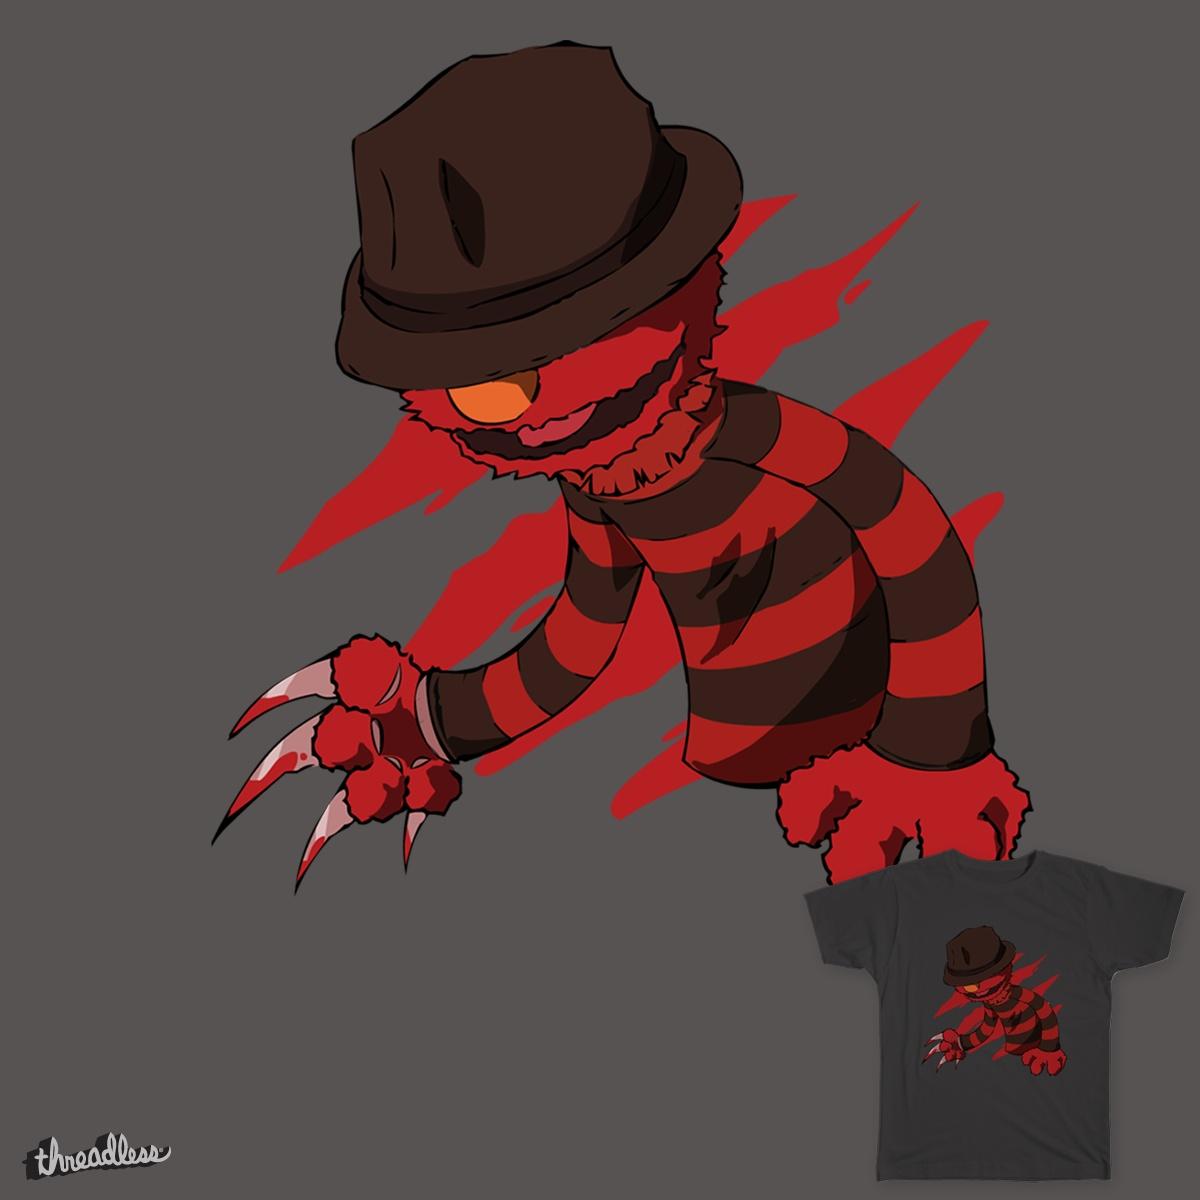 A Nightmare on Elmo Street by batarchaic on Threadless